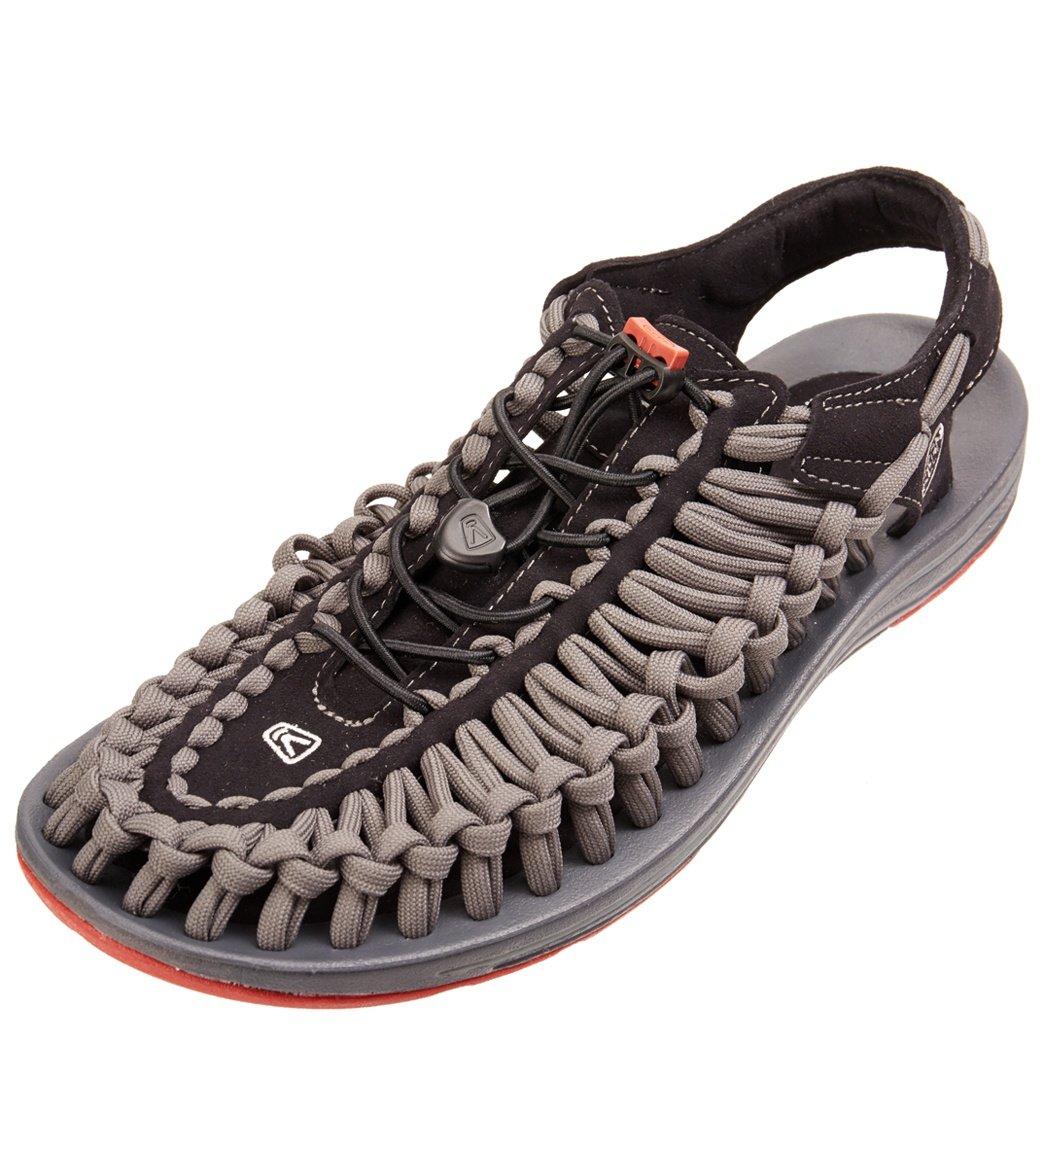 ecca60f29a6 Keen Men's Uneek Flat Cord Water Shoes at SwimOutlet.com - Free Shipping